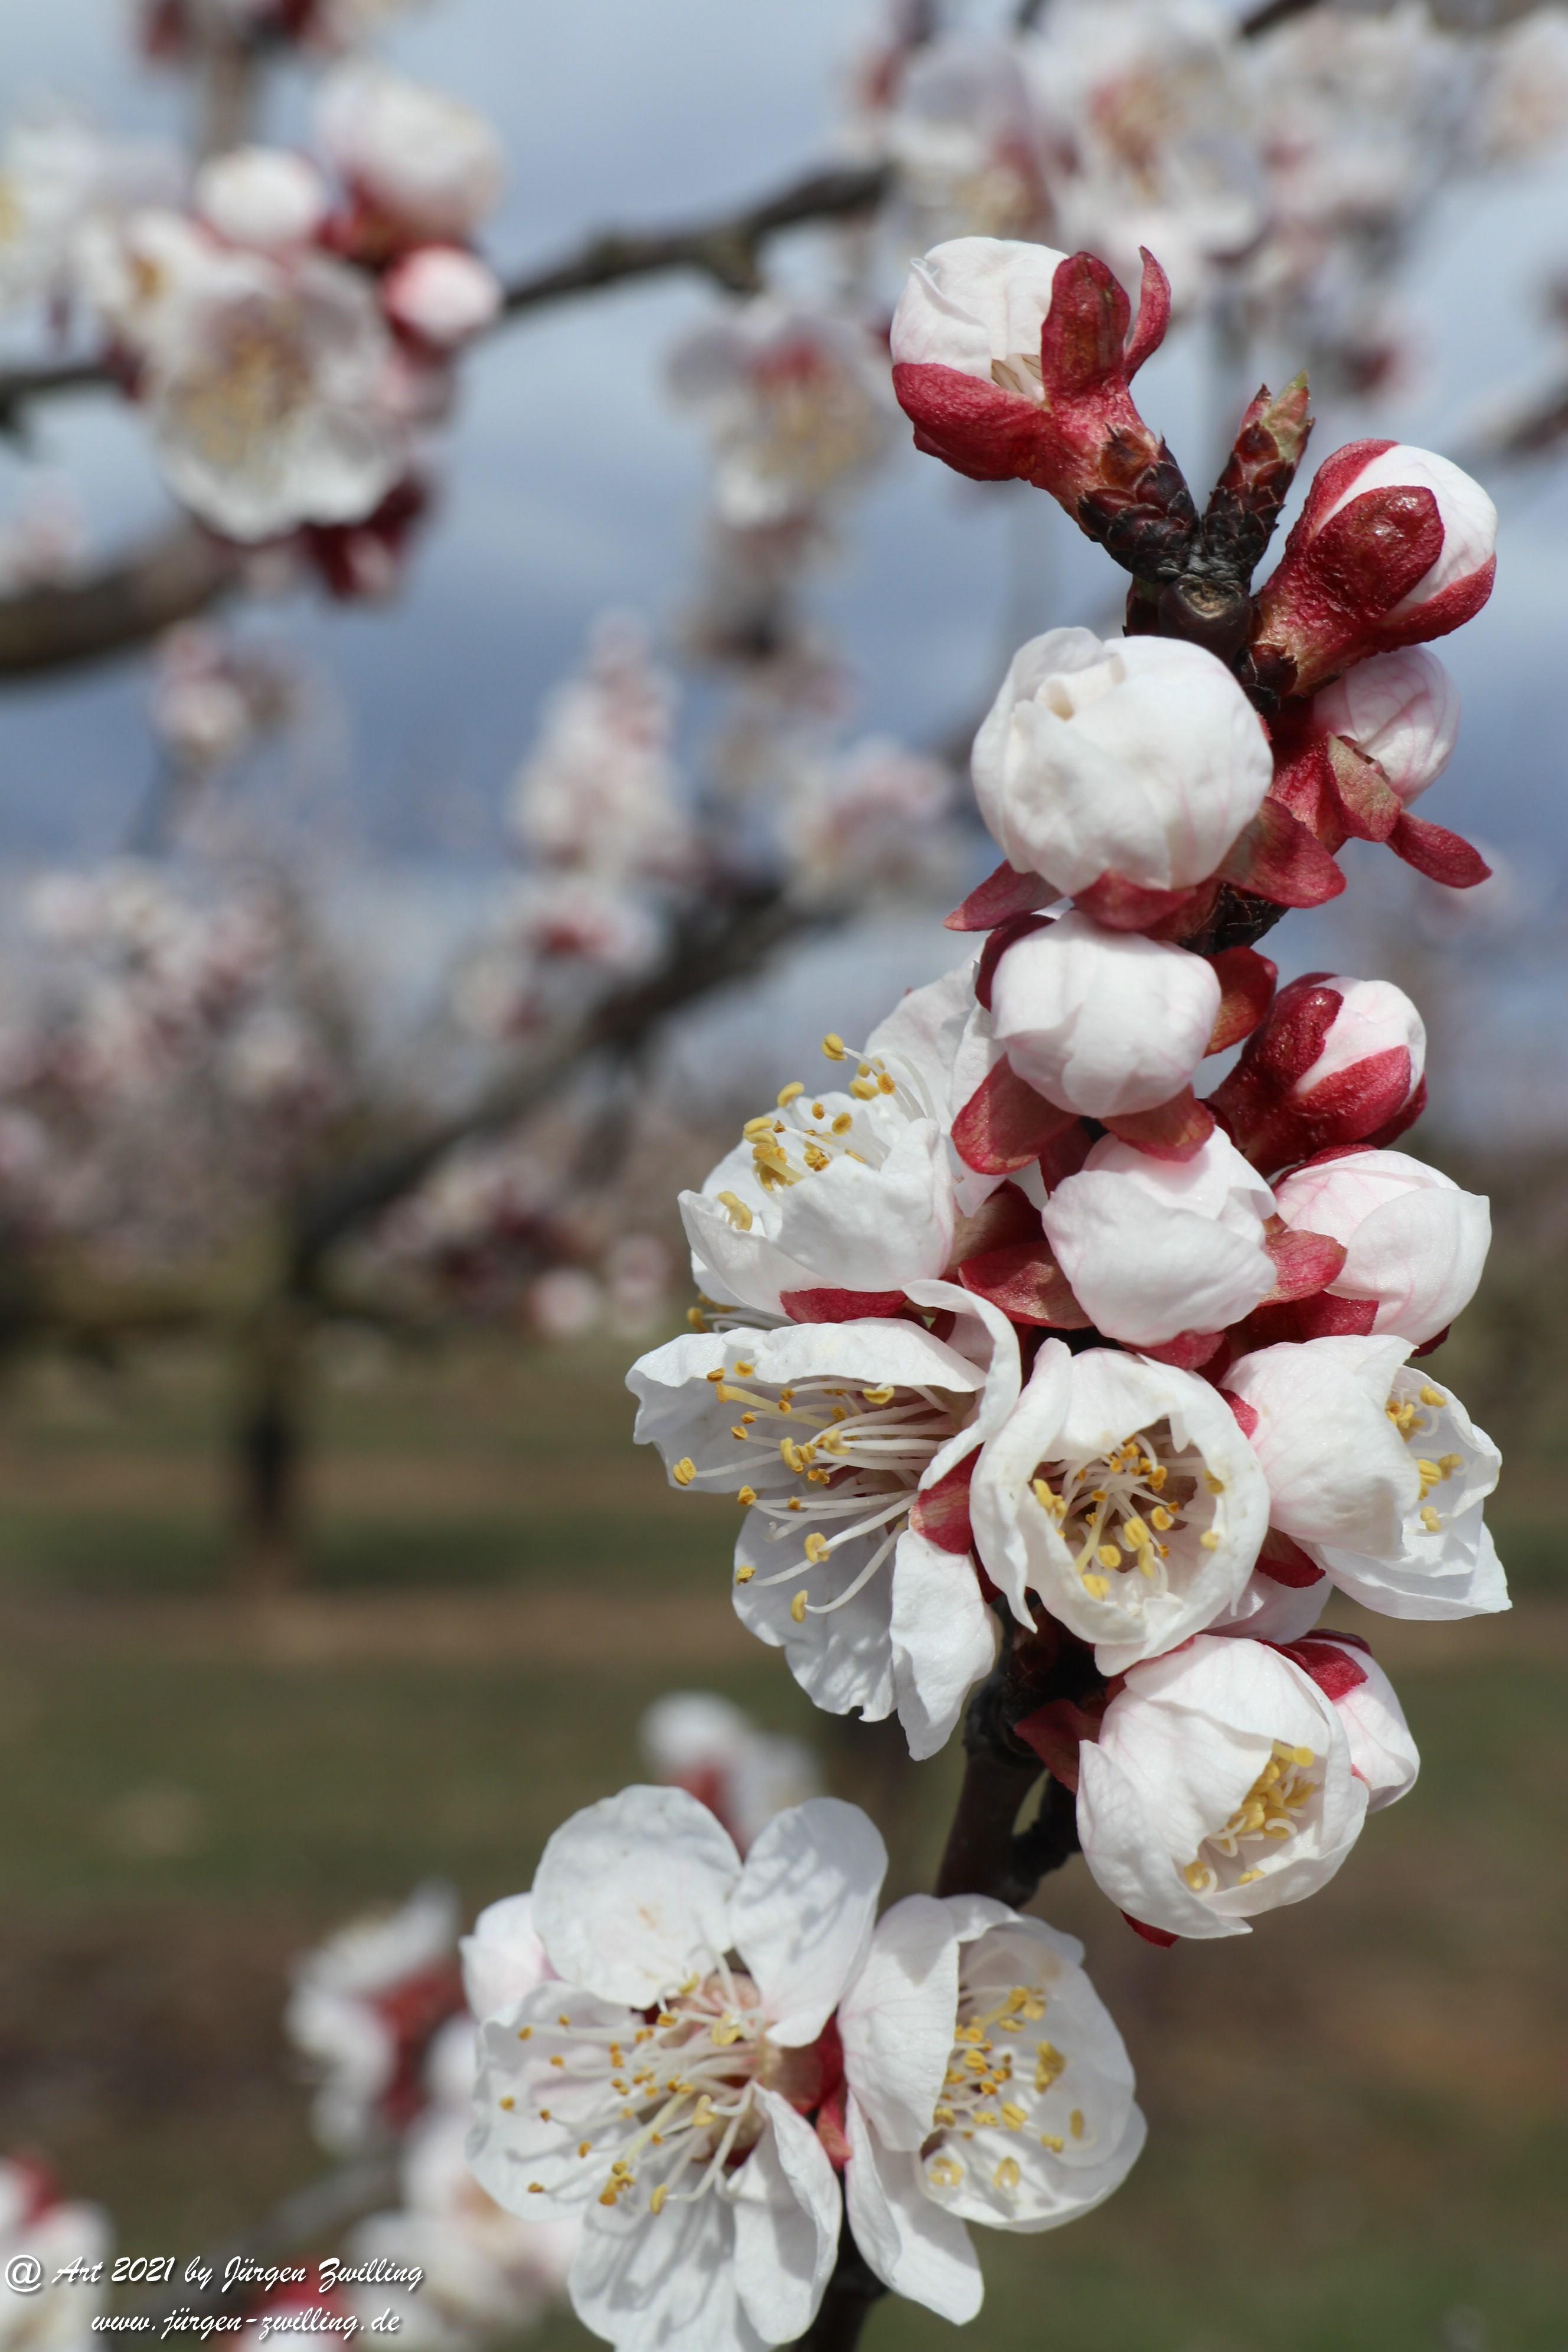 Aprikosenblüte 11